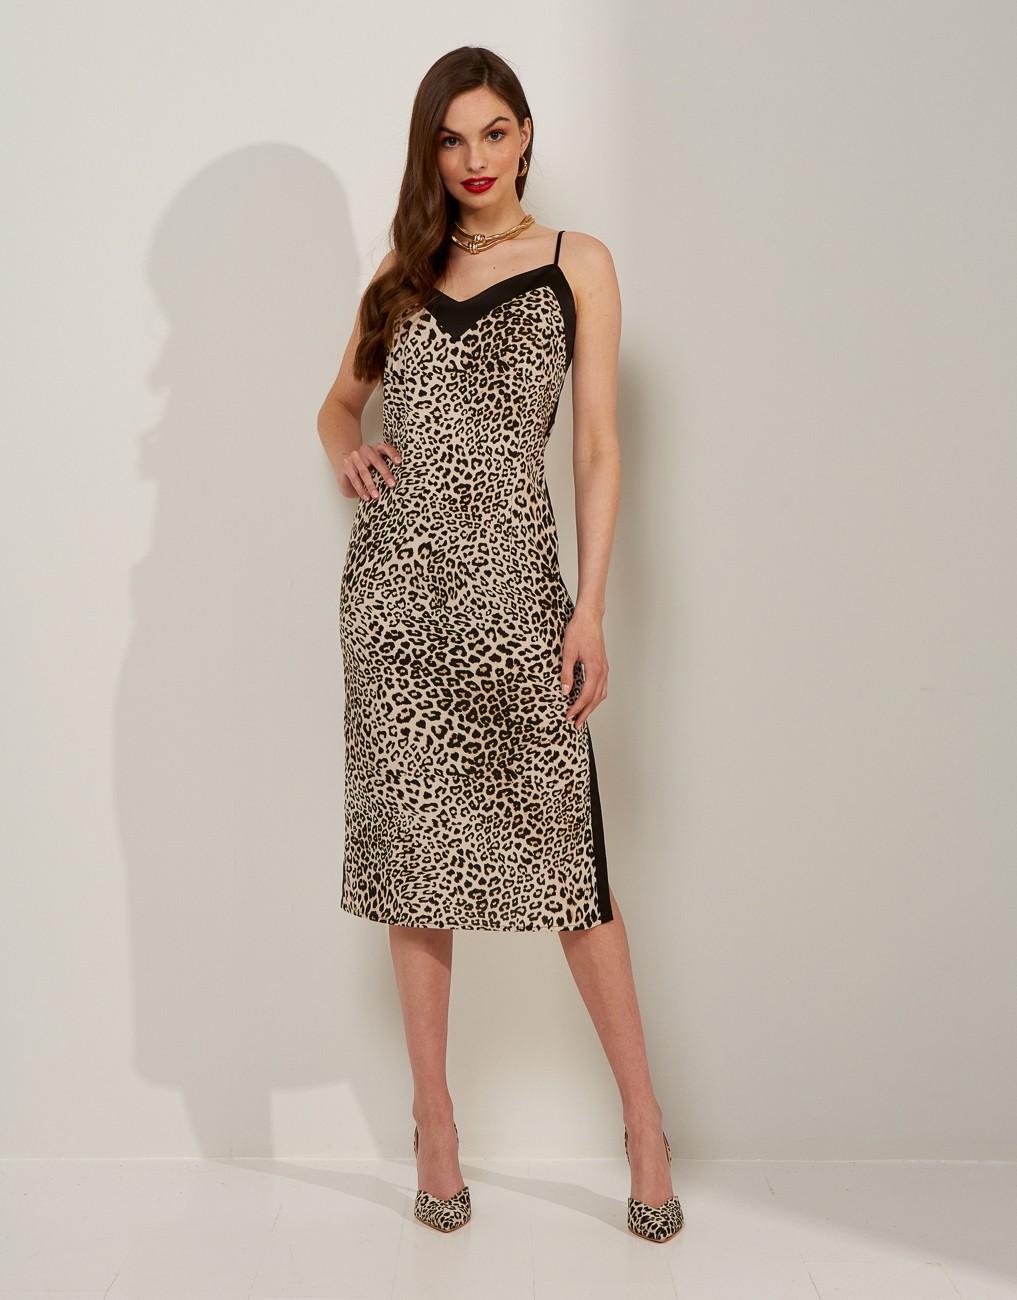 Midi animal print dress